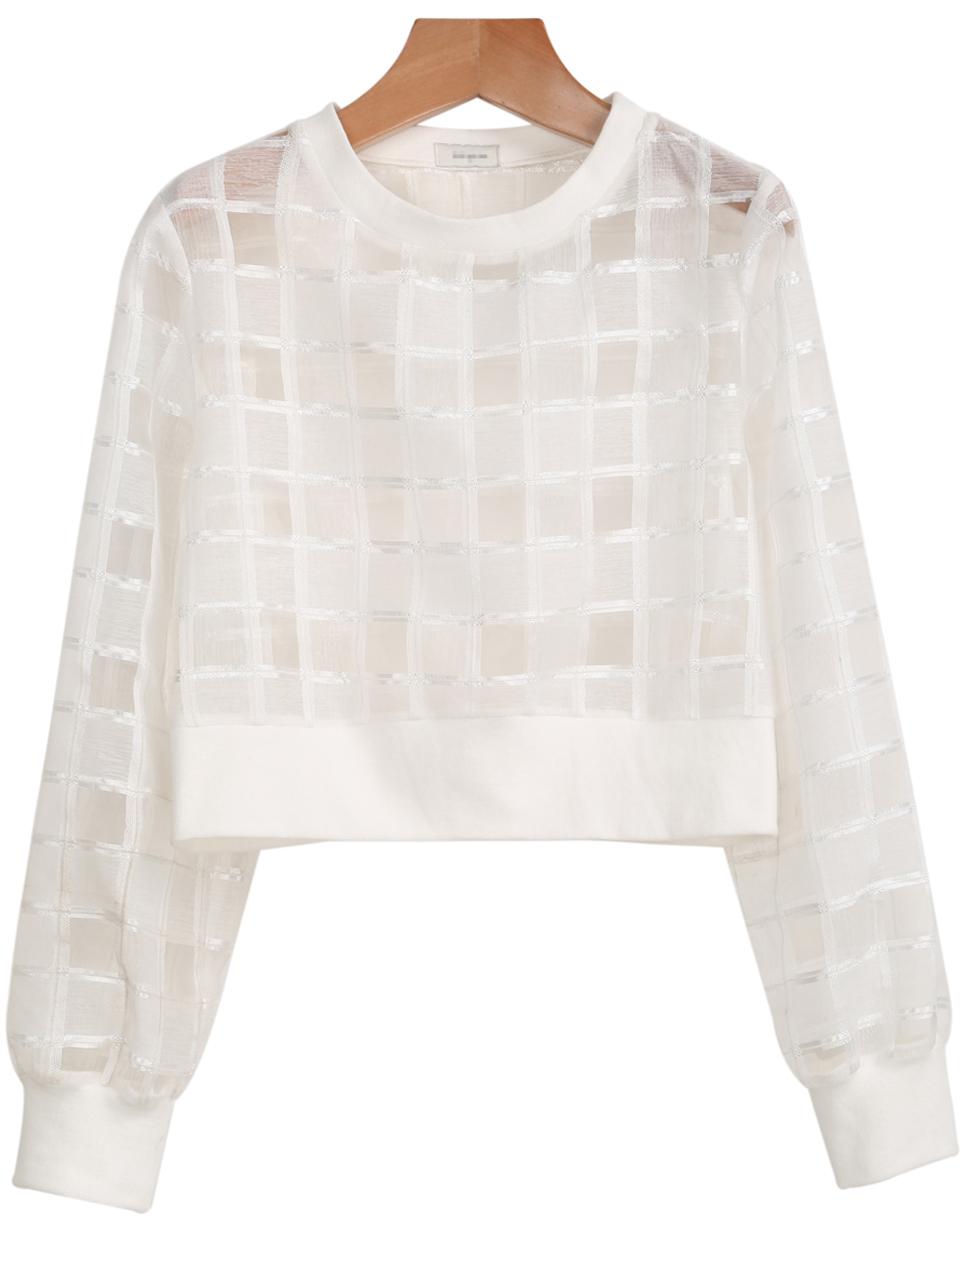 White Long Sleeve Sheer Plaid Crop Blouse - Sheinside.com